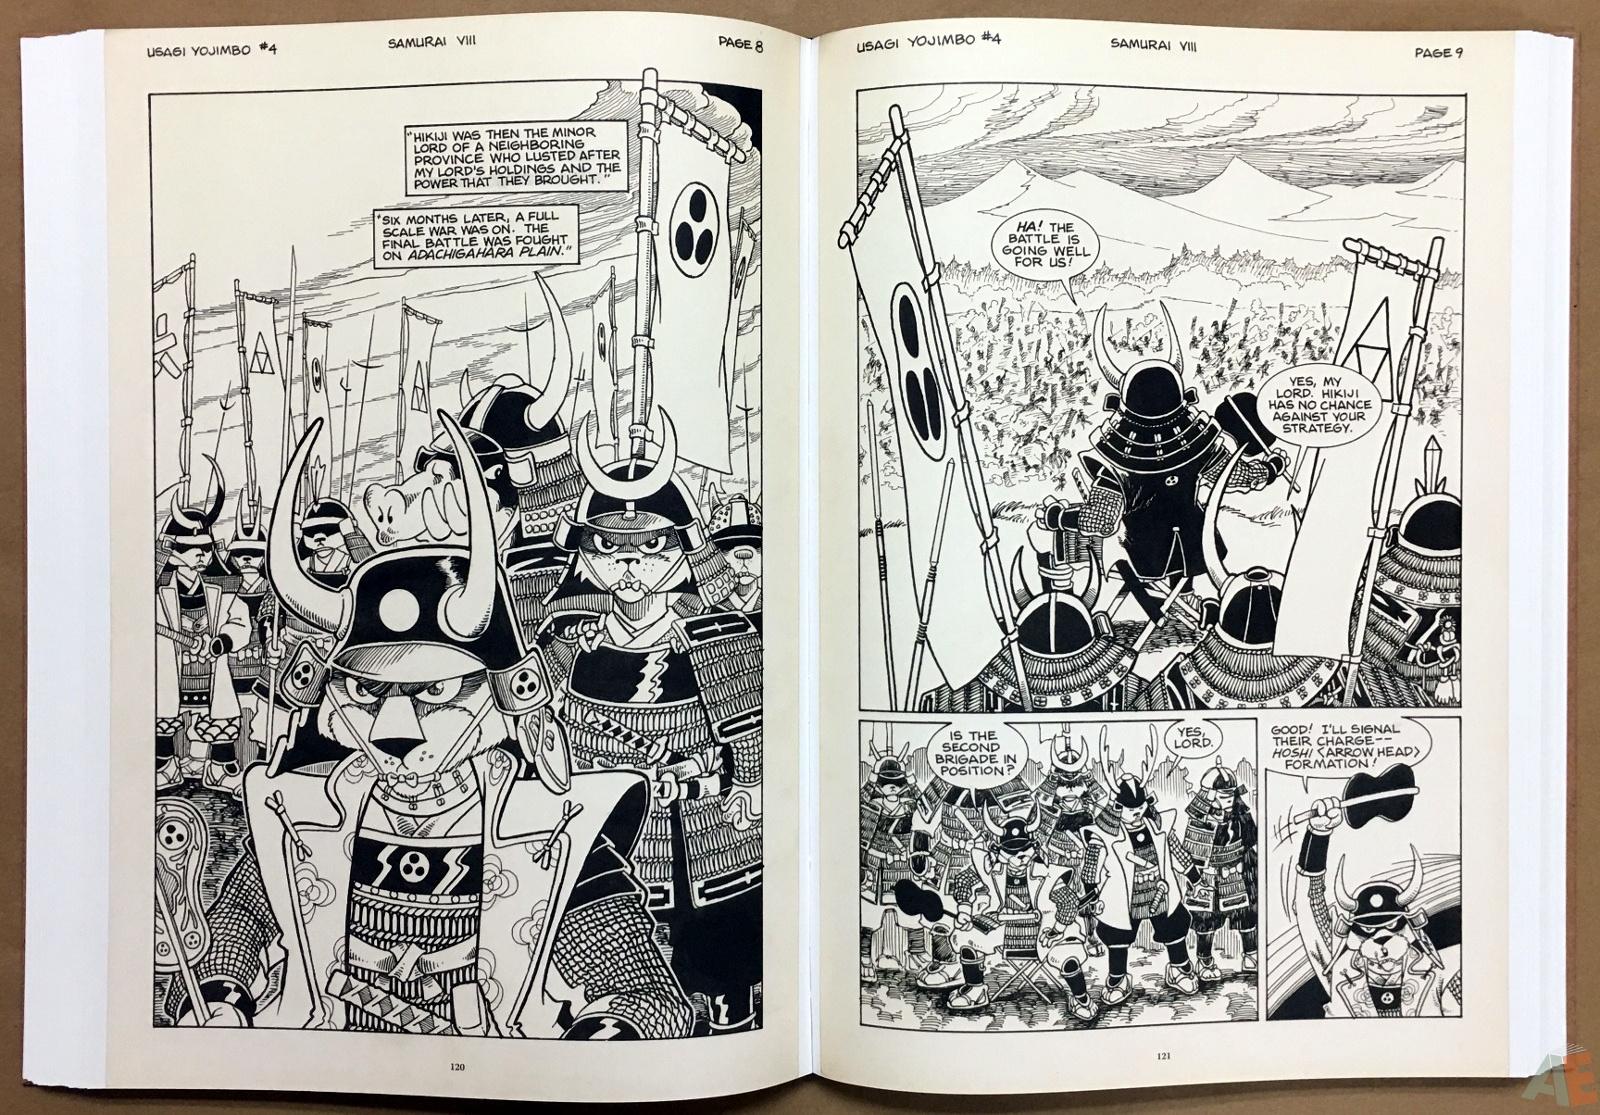 Usagi Yojimbo: Samurai and Other Stories Gallery Edition 24